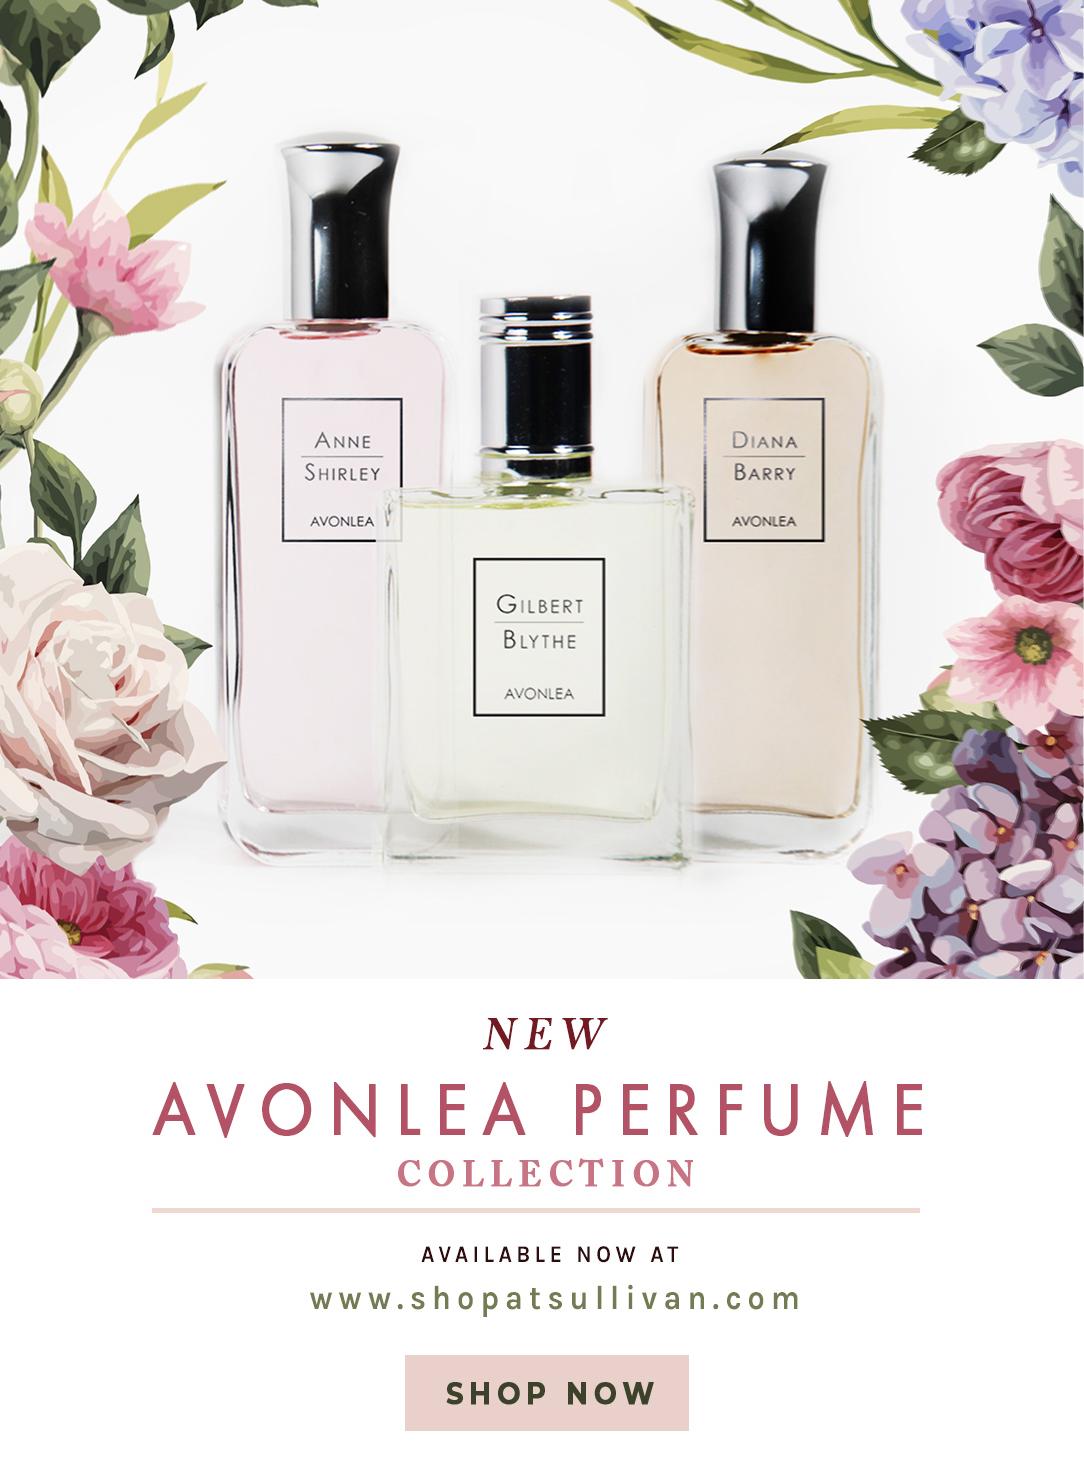 092118_Avonlea_Perfume_Collection .jpg